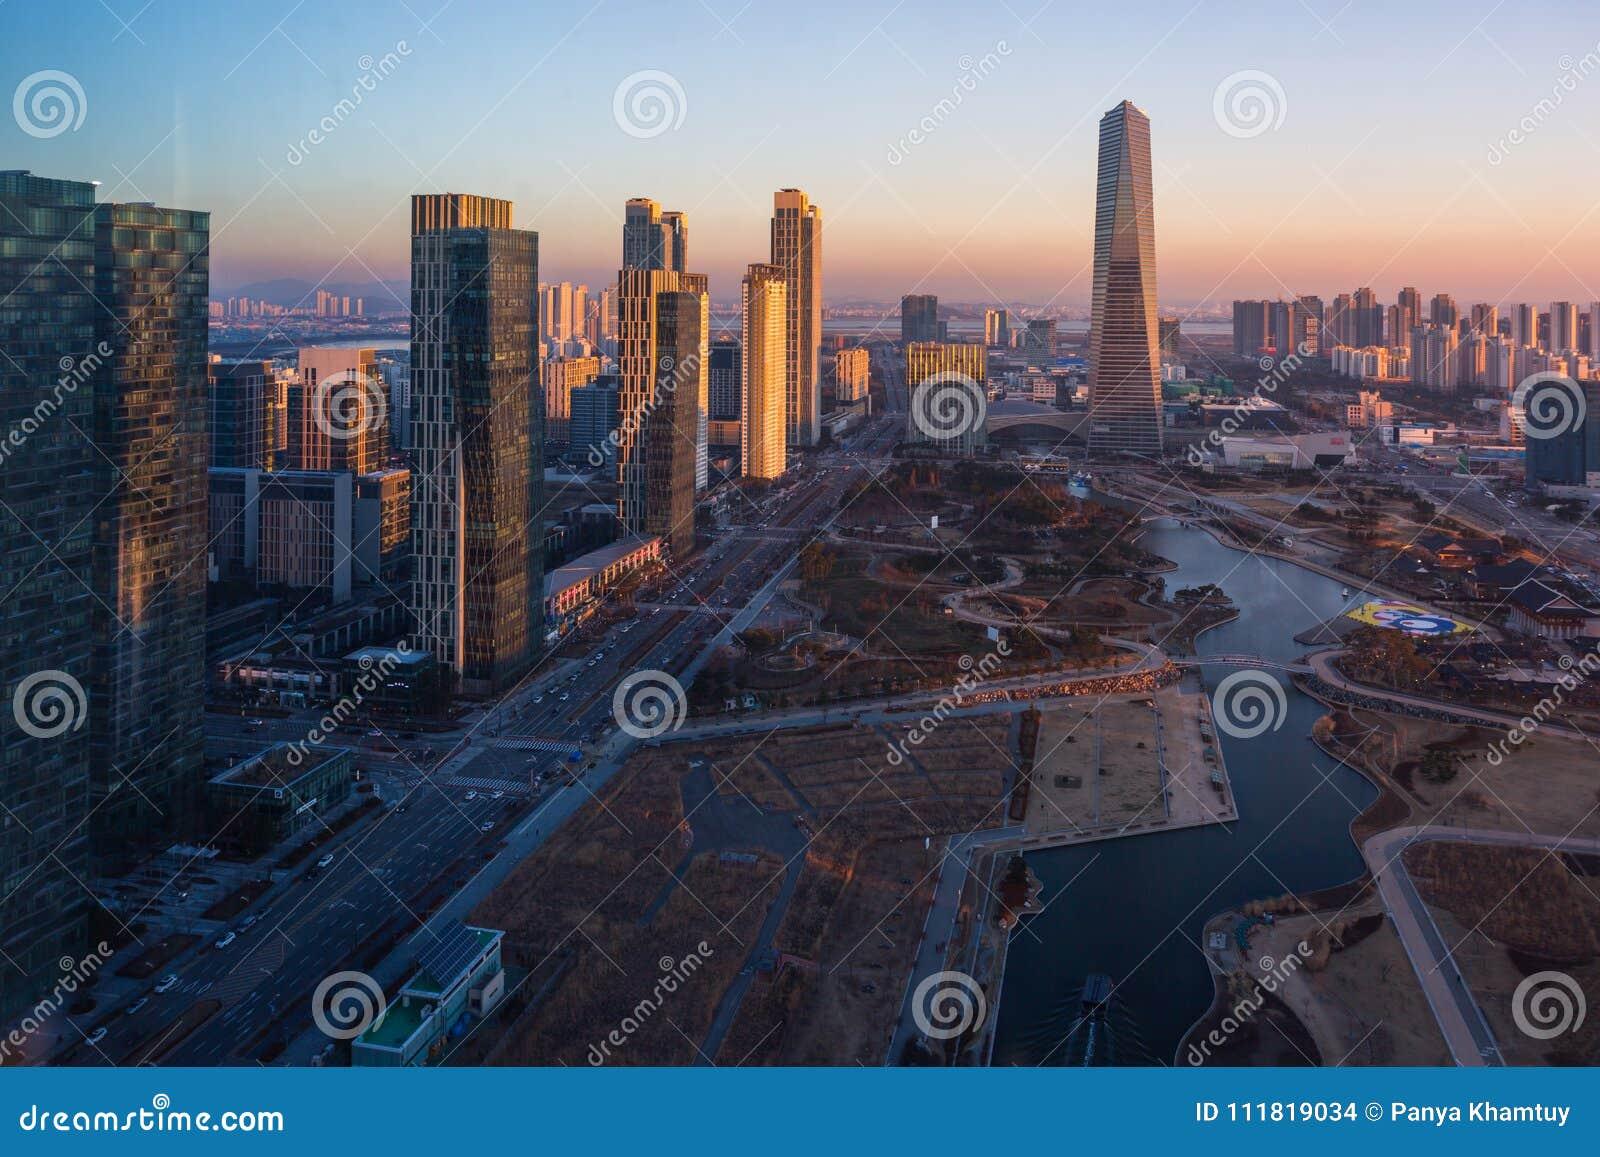 Korea-Stadt im Sonnenuntergang, Central Park in Songdo-Bezirk, Incheon